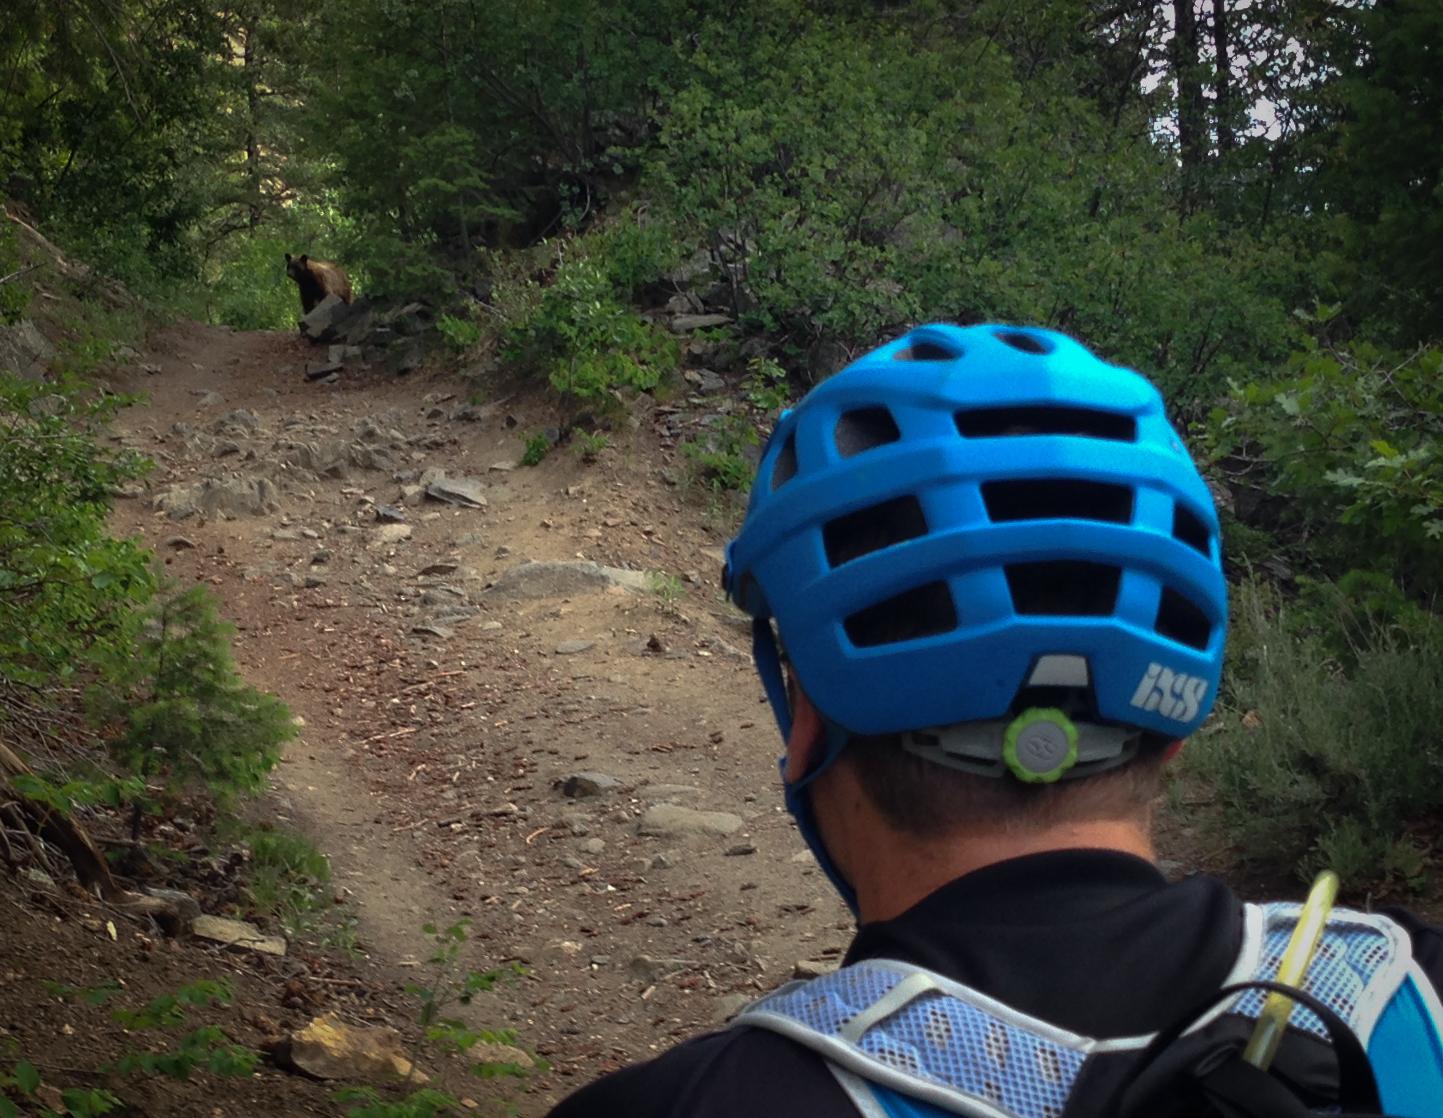 Review Ixs Trail Rs Mountain Bike Helmet Singletracks